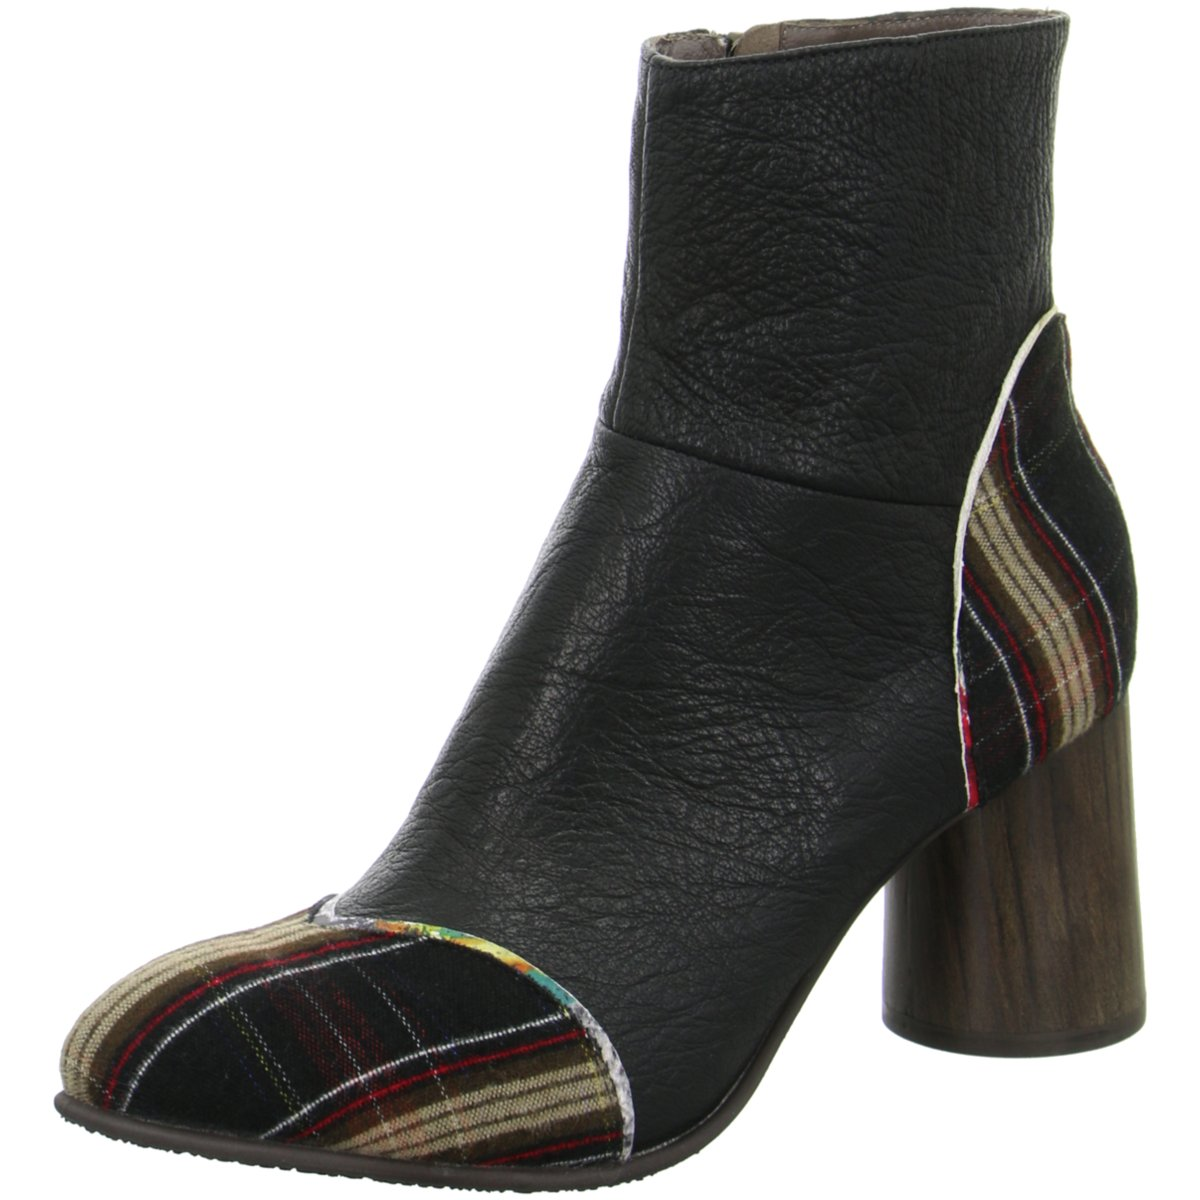 NEU Yoshokhai Damen High Damen Stiefeletten CBRBONE61 schwarz 102678